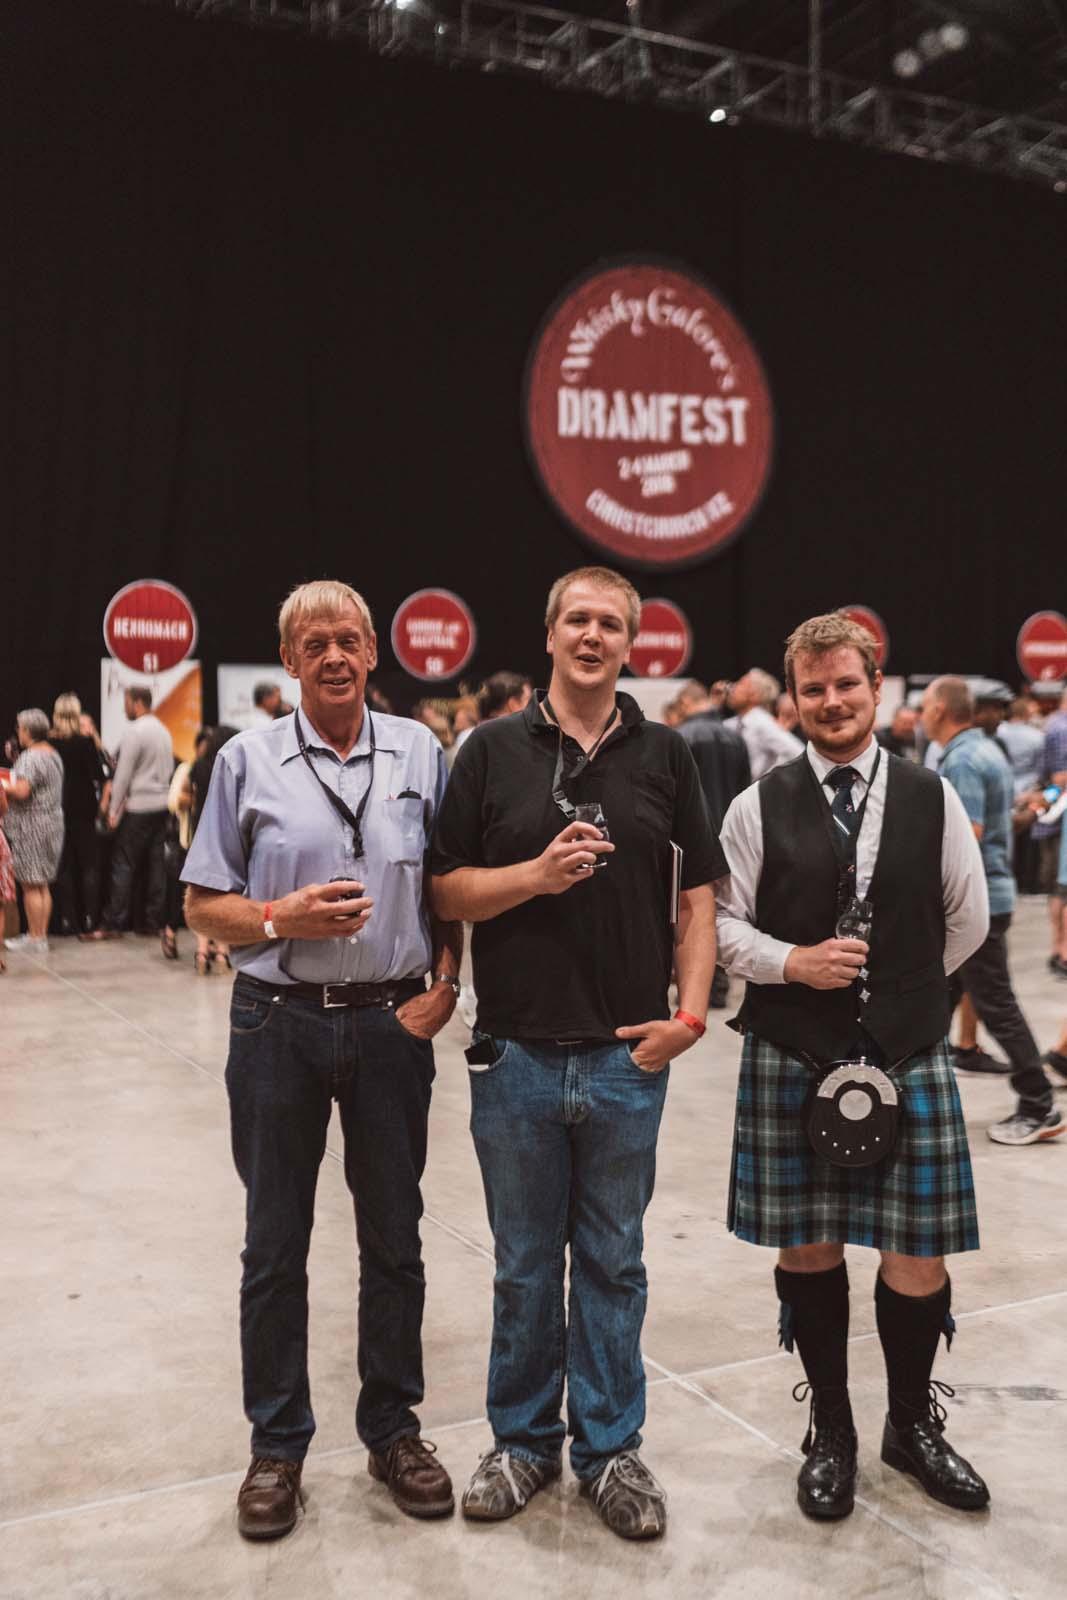 Dramfest 2018 for Whisky Galore-329.jpg